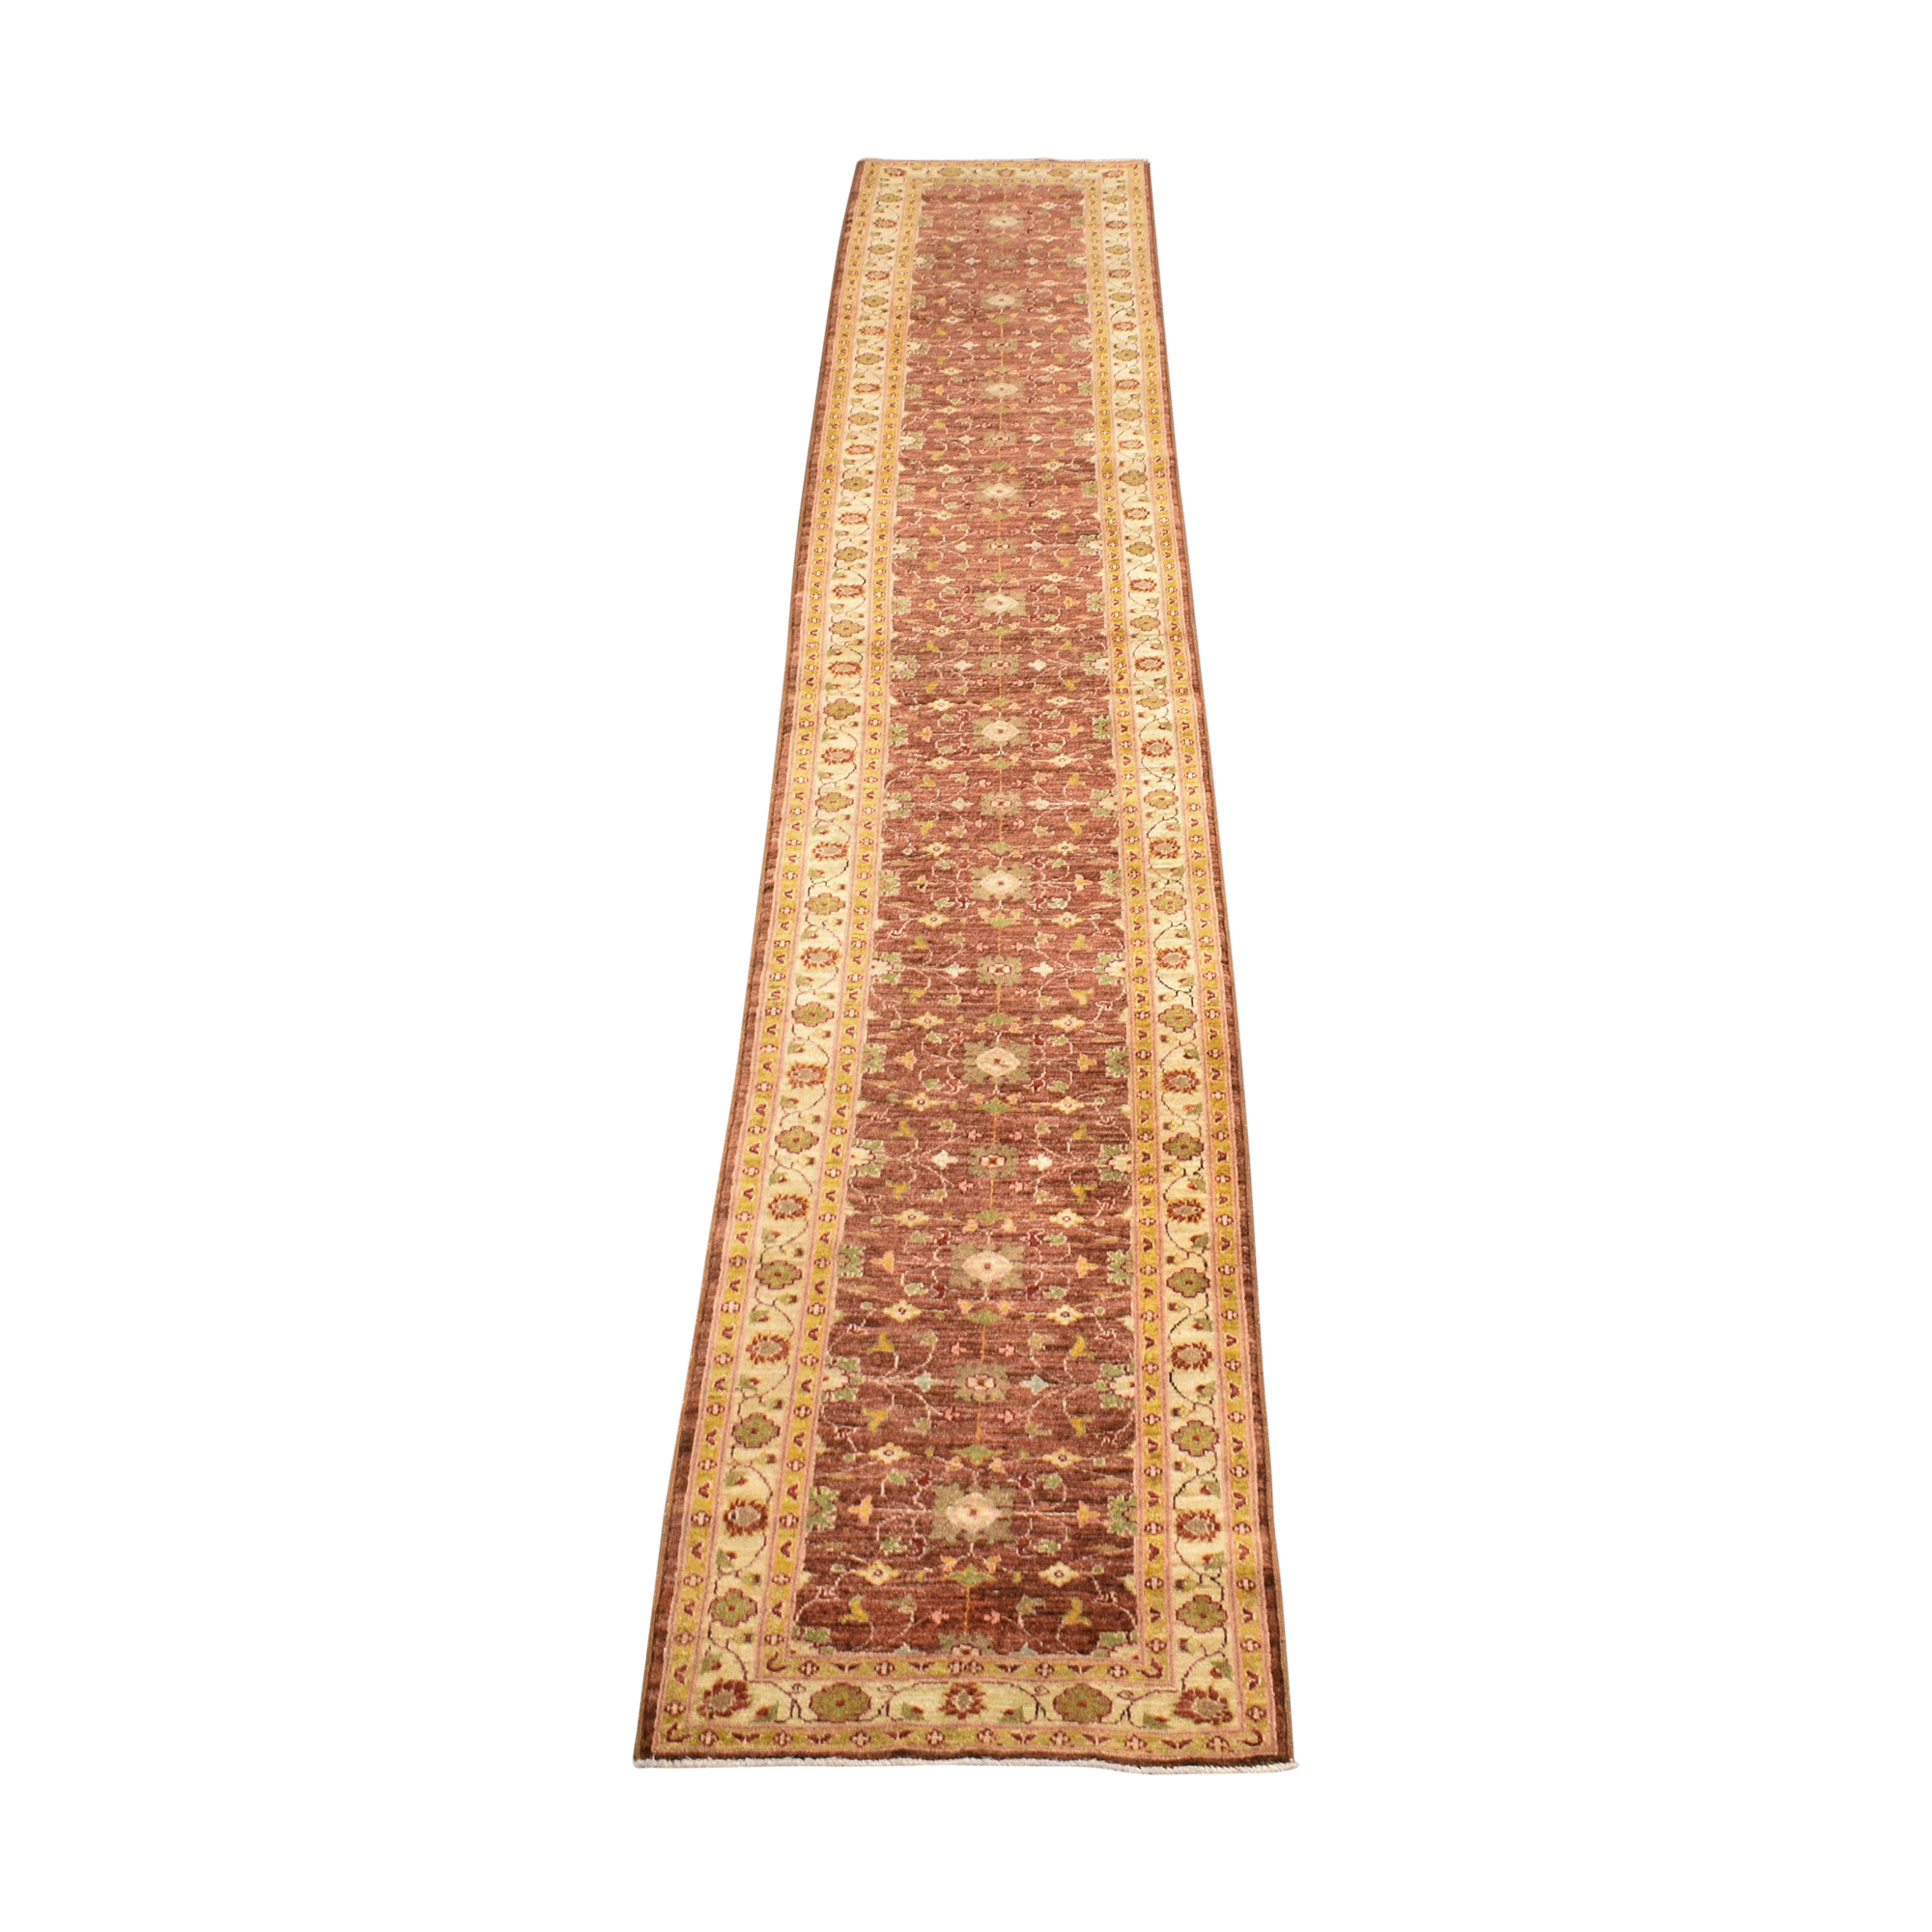 Al Mumtaz International Oriental Runner Rug price